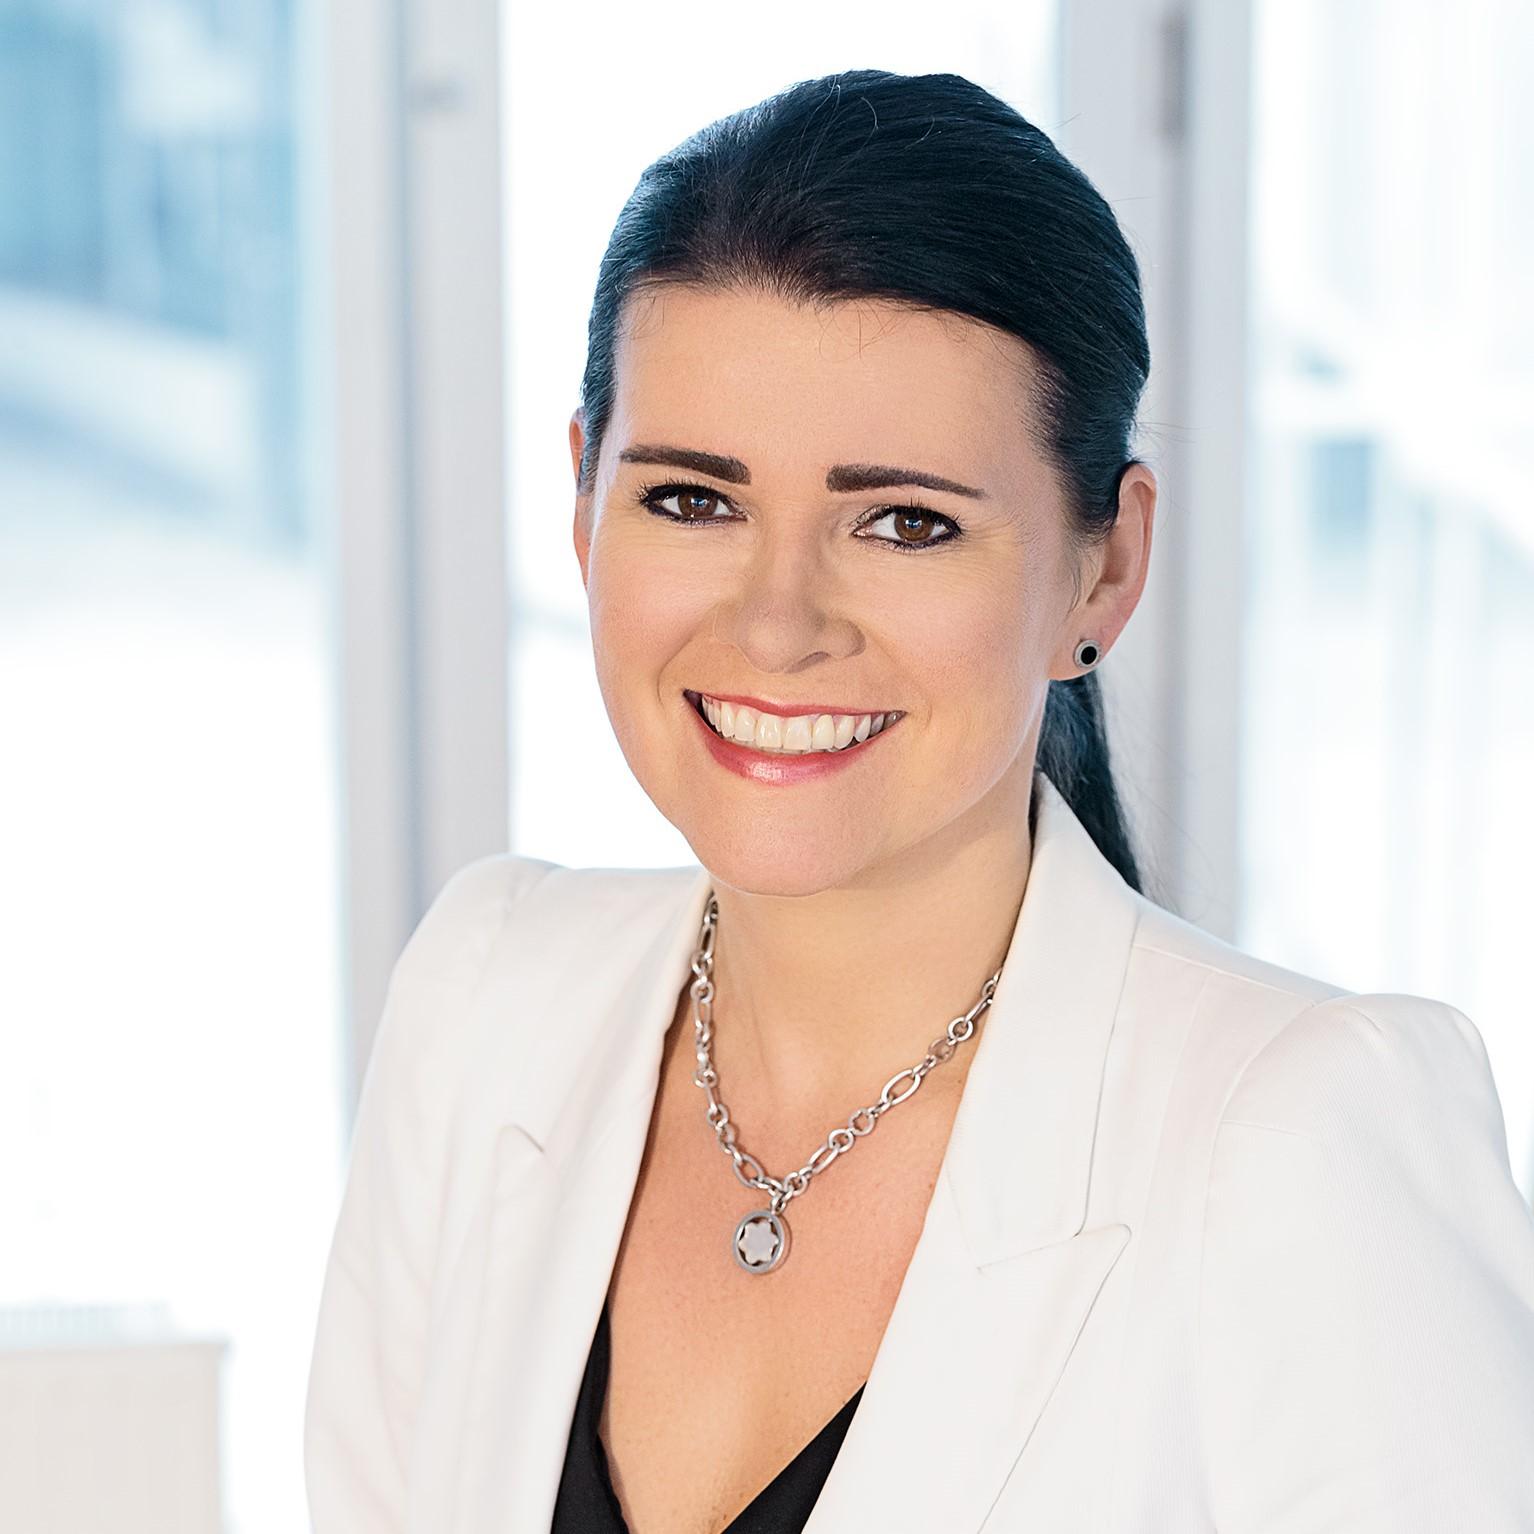 Dr. Rita Niedermayr